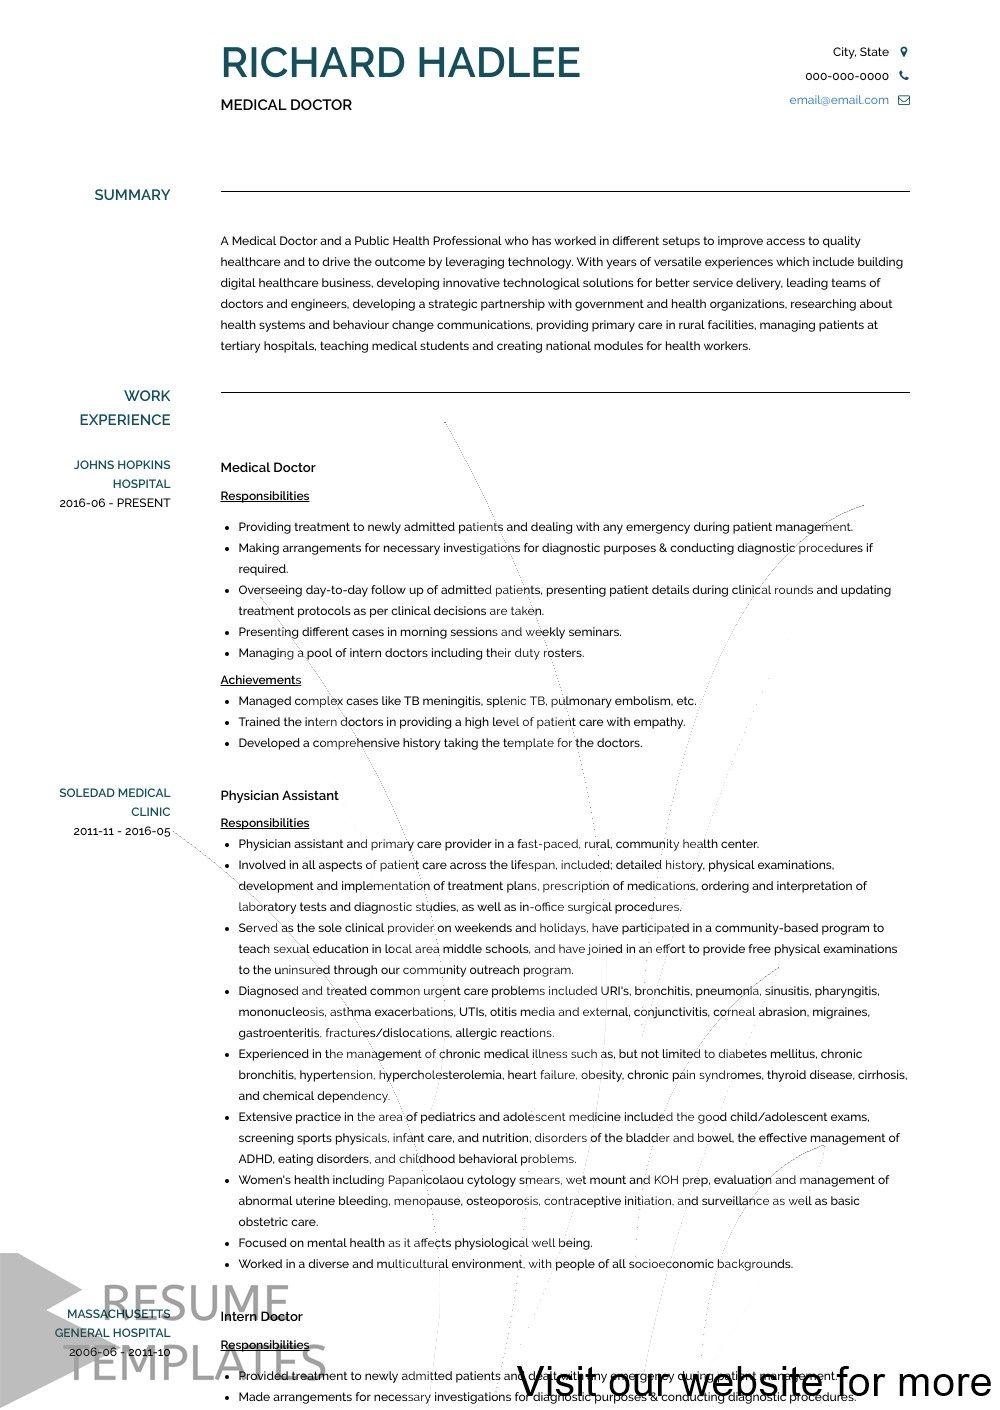 resume examples skills Professional in 2020 Job